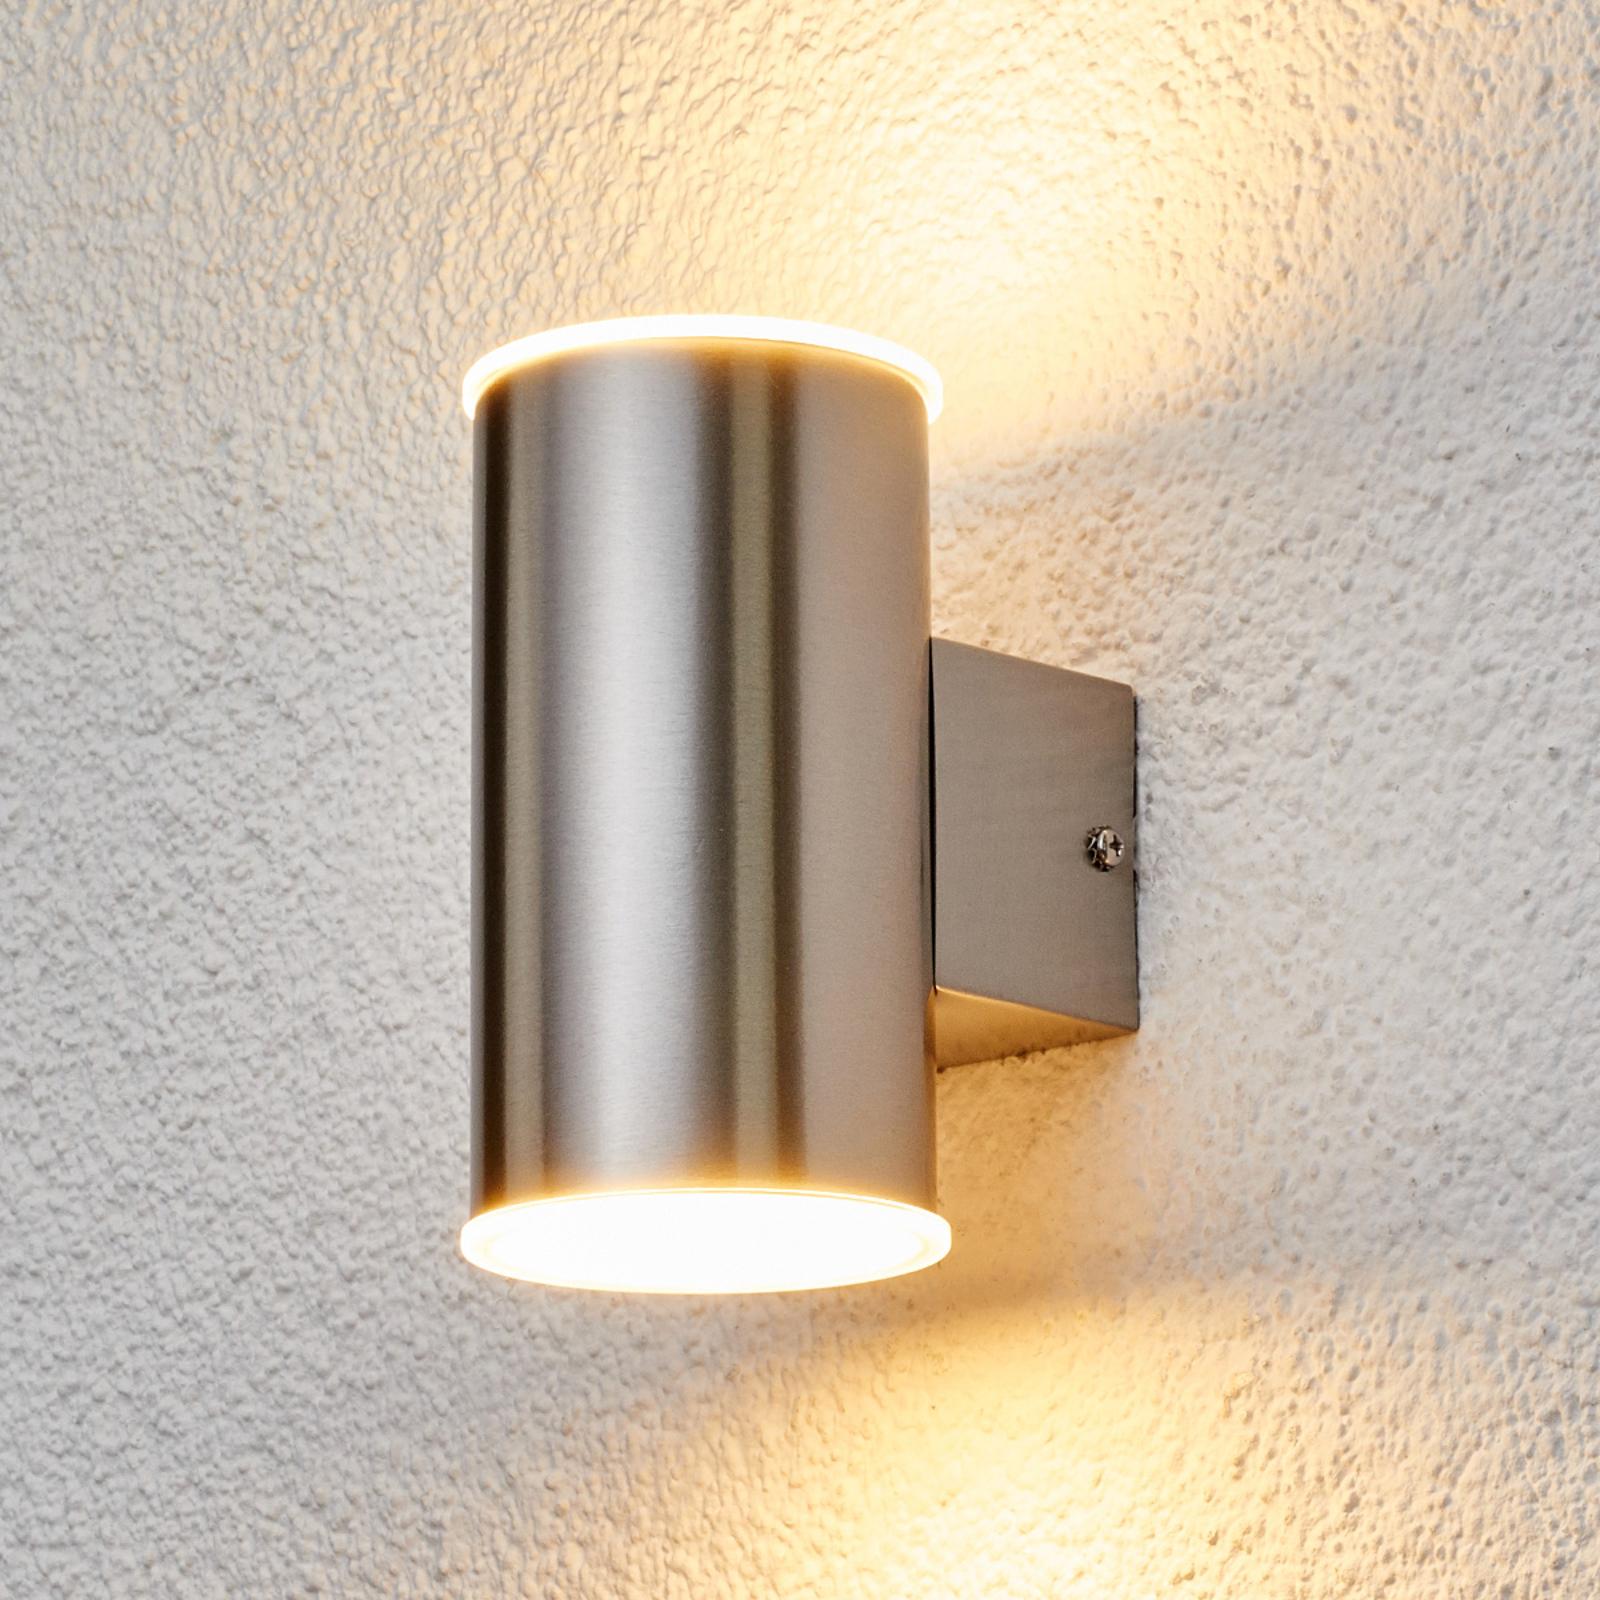 Morena - utomhusvägglampa i rostfritt stål m LED